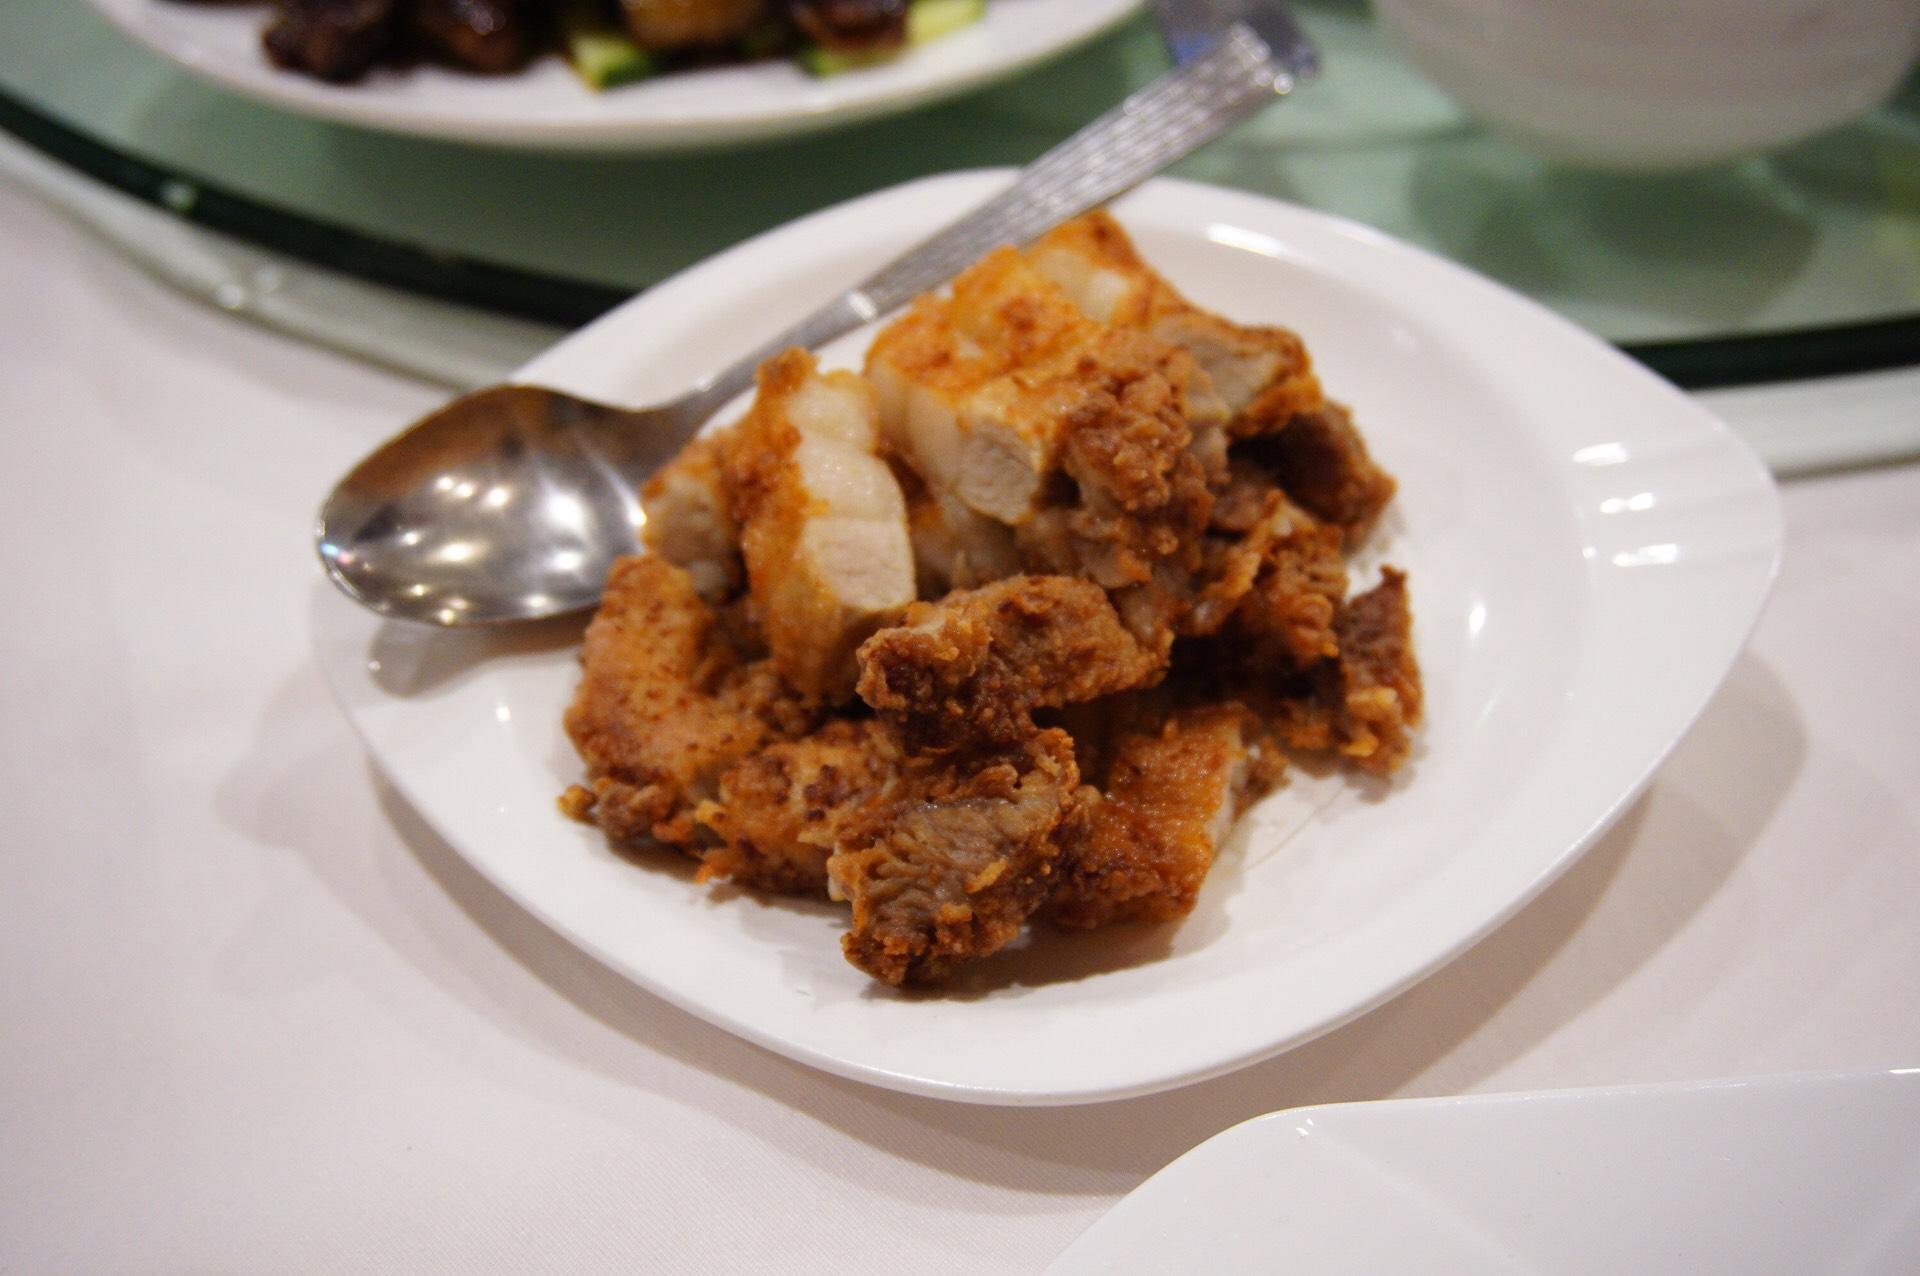 Kenko Home Cuisine's Fried Hakka Pork Belly